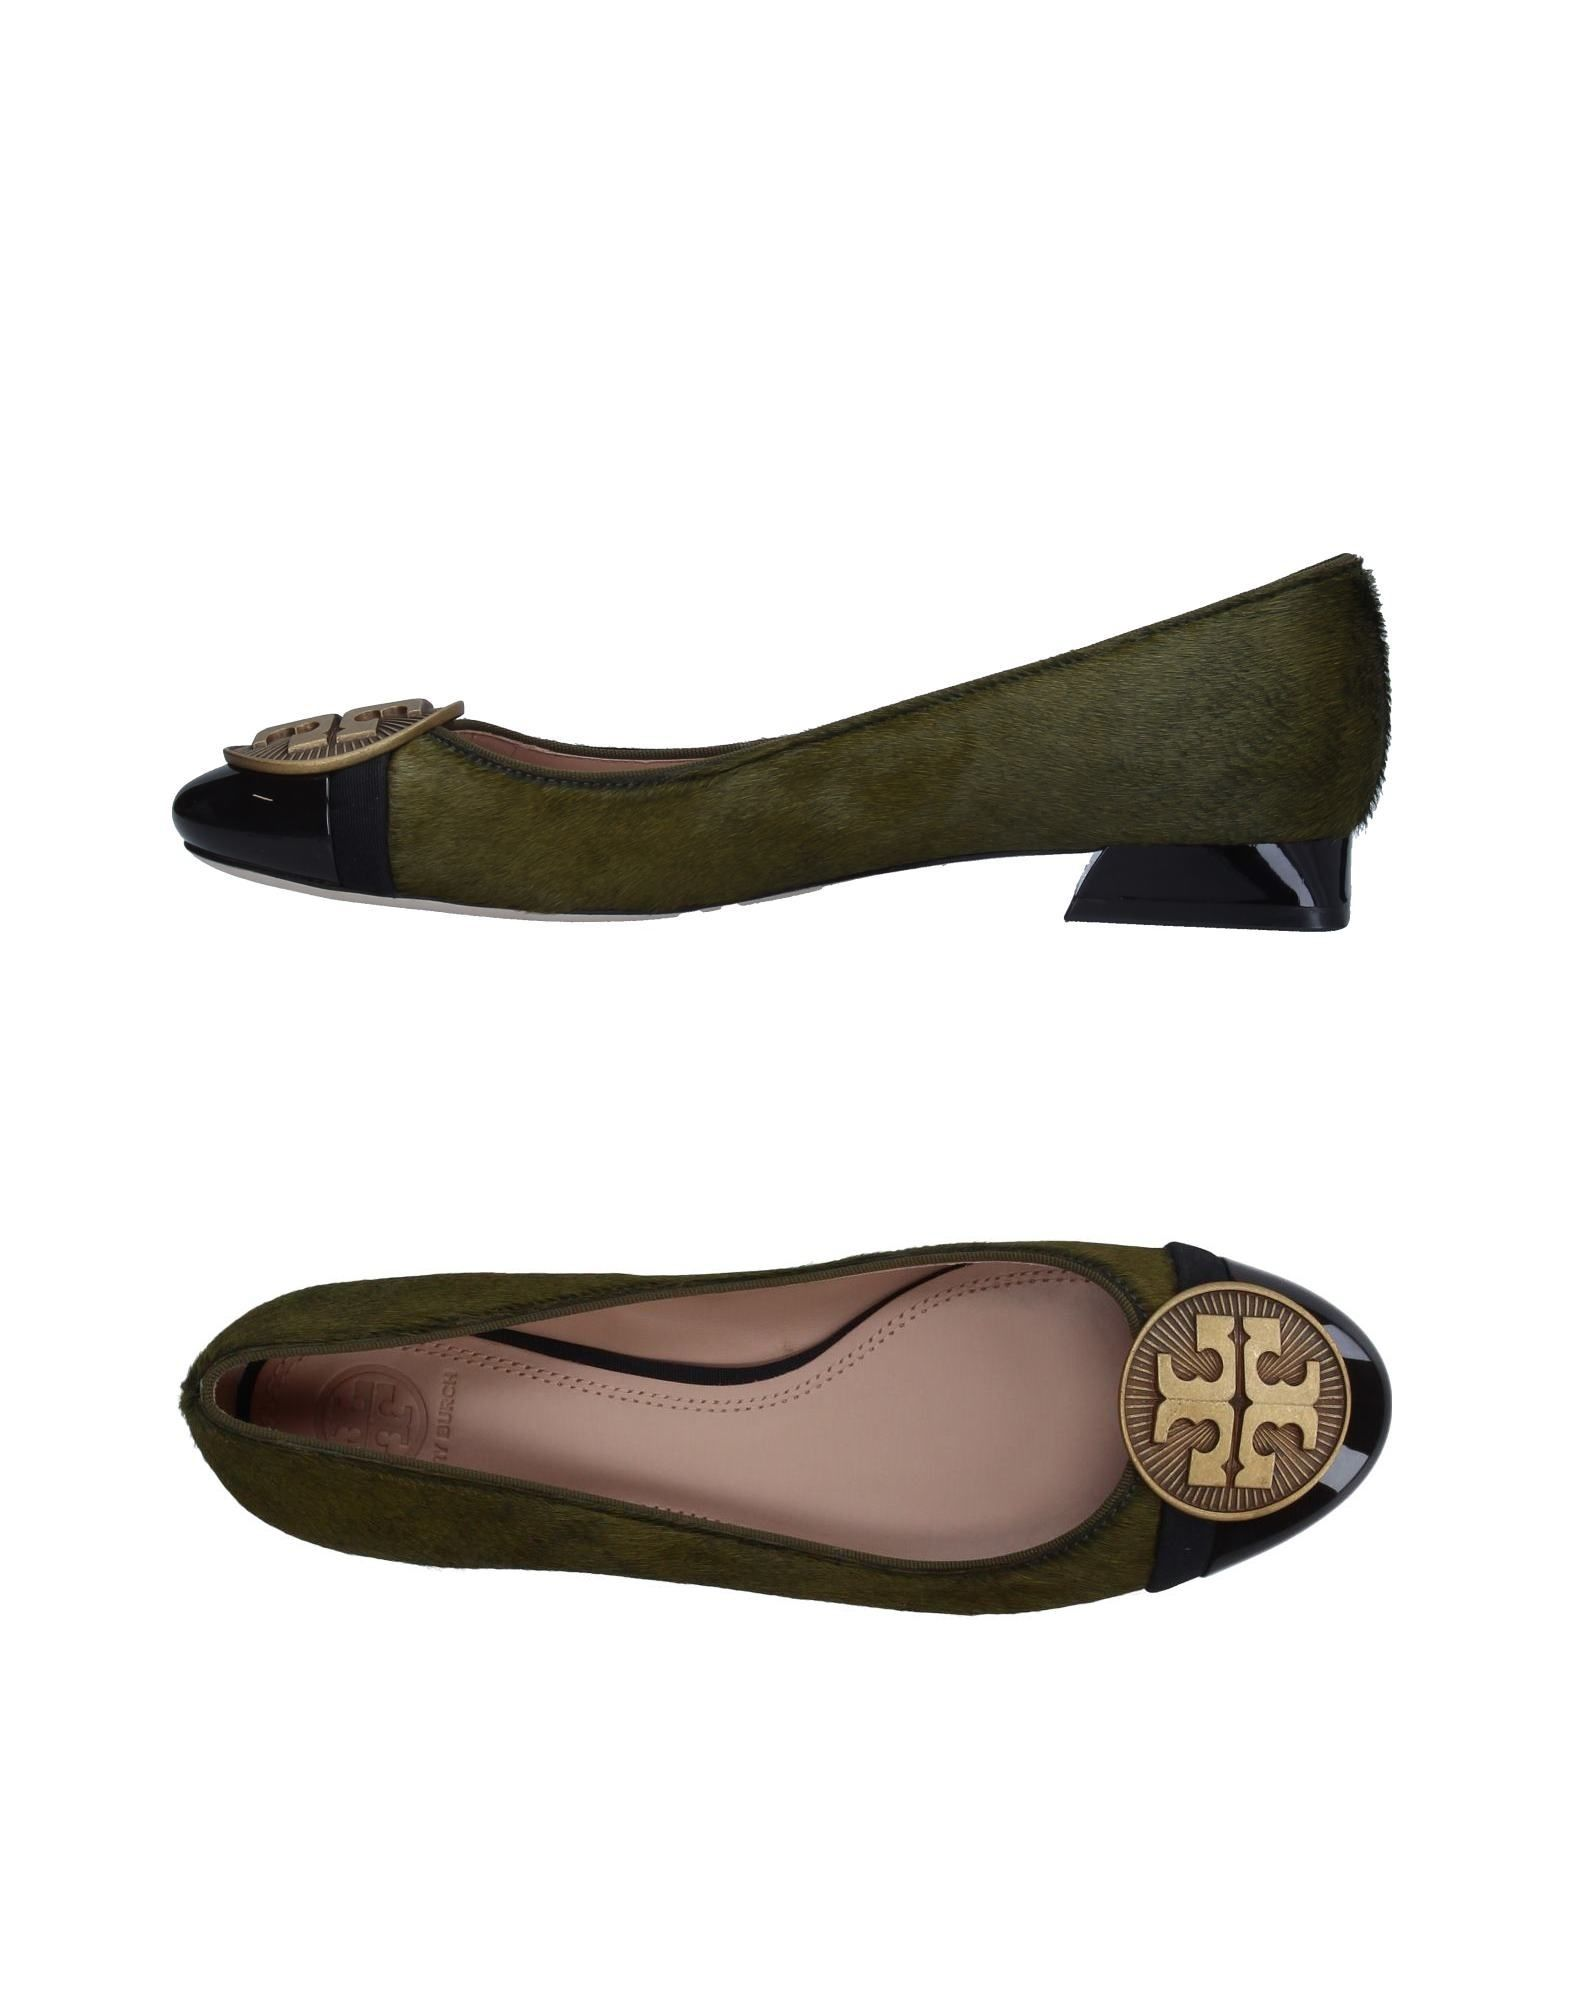 Stilvolle billige Schuhe Tory Burch Pumps Damen  11328118LX